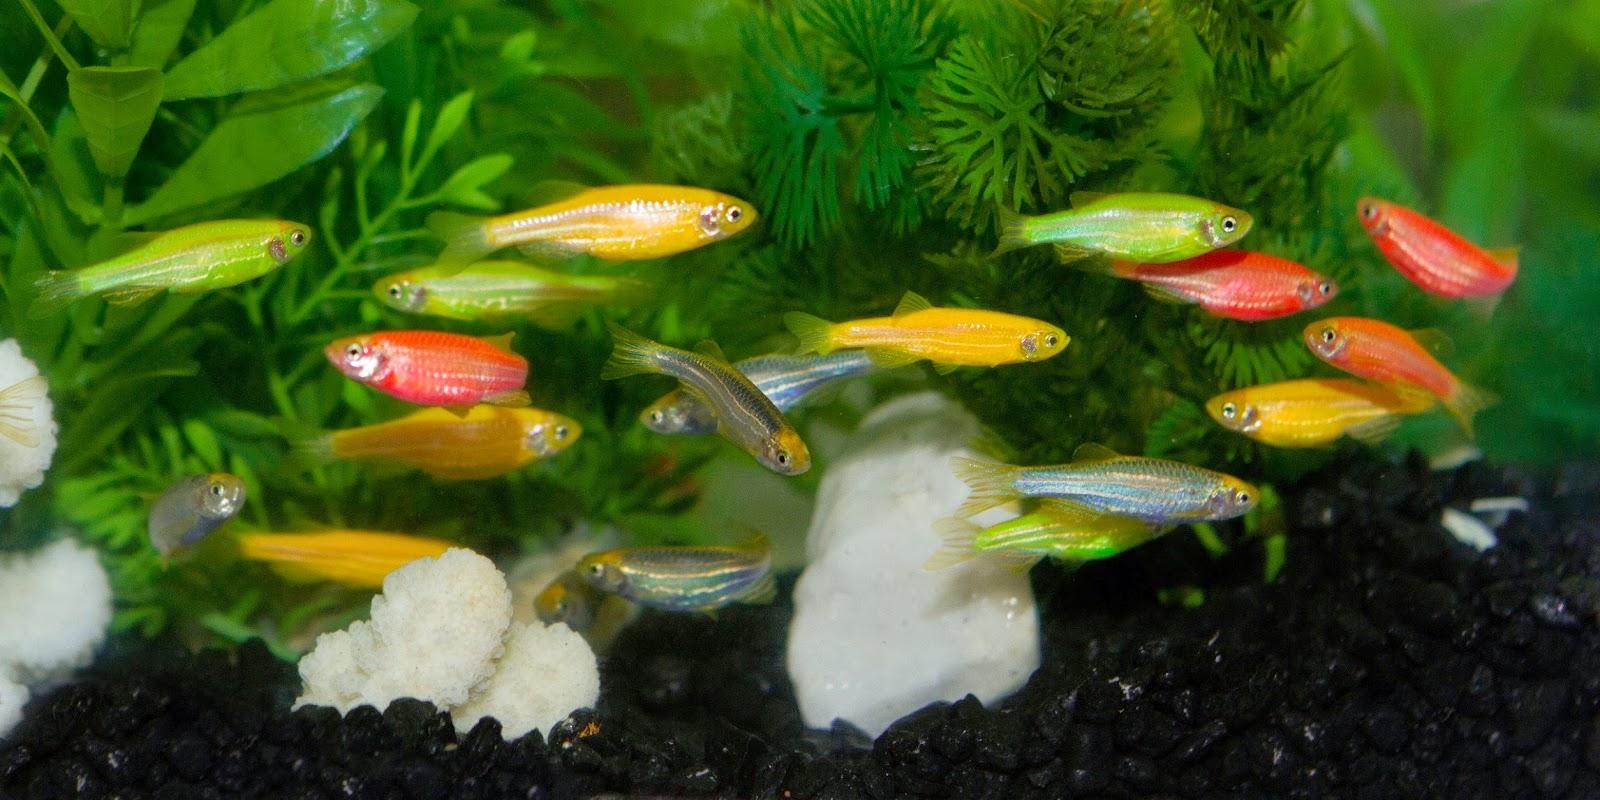 Peces transg nicos for Criadero de peces de colores